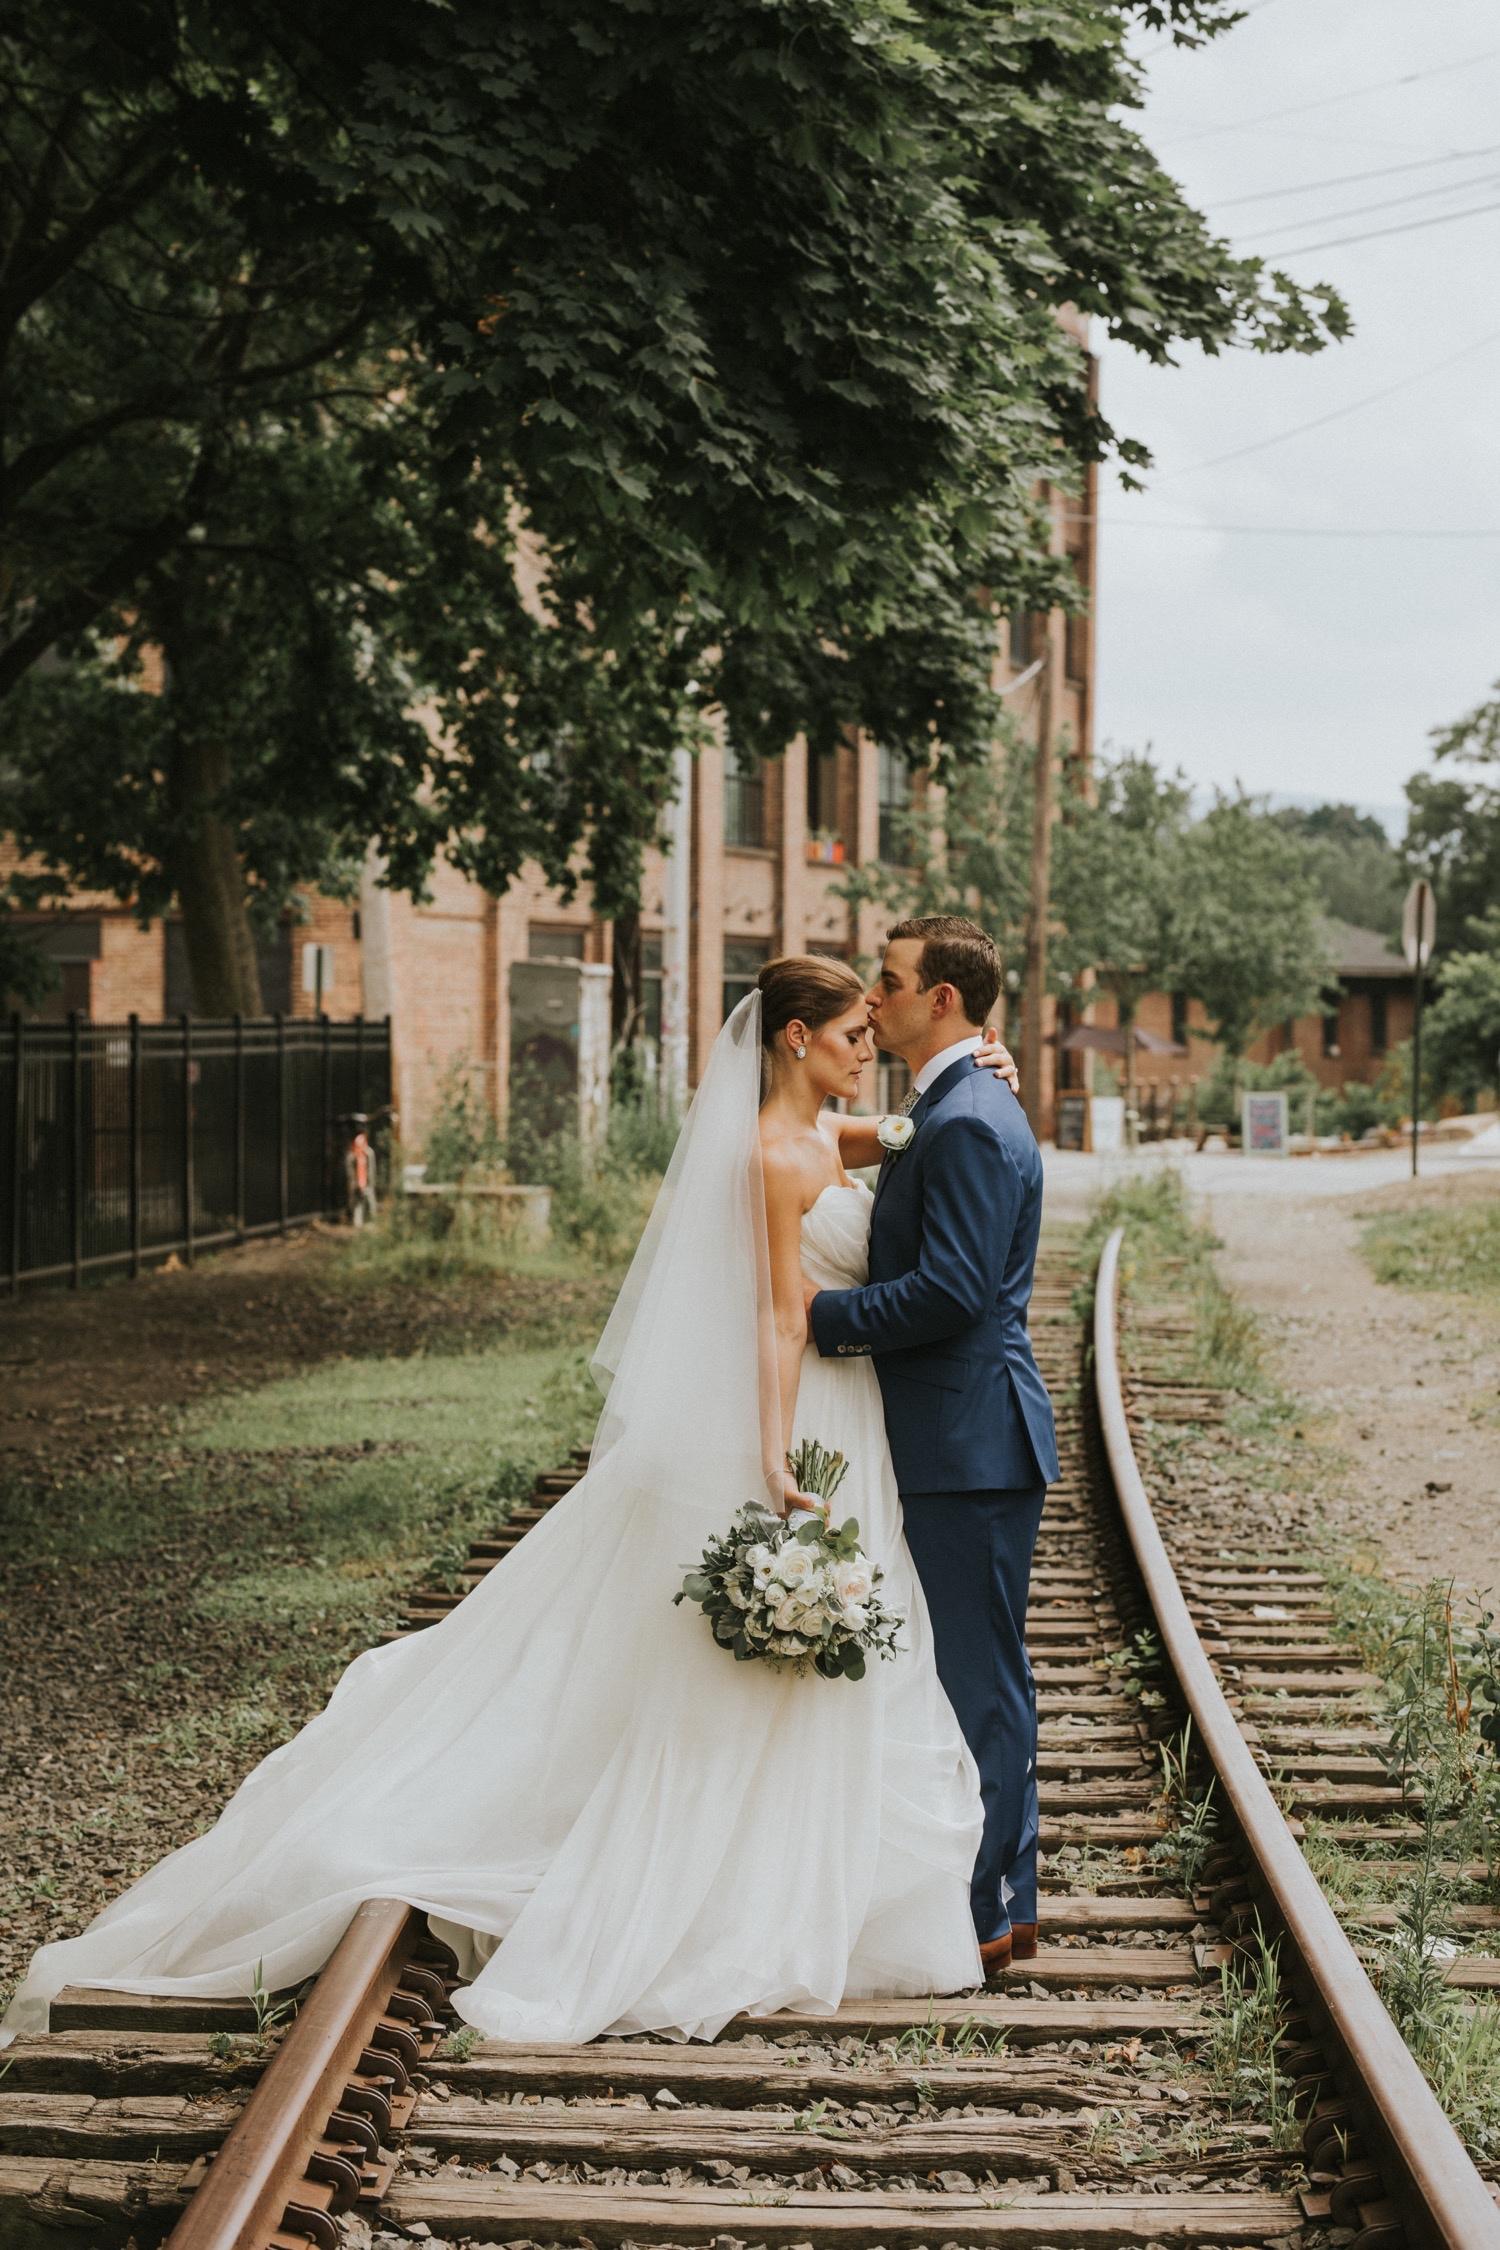 Hudson Valley Wedding Photographer, The Roundhouse Beacon, The Roundhouse Wedding, Wedding Details, Lazaro Bridal, Robert Bullock Bridal, New York Wedding, First Look